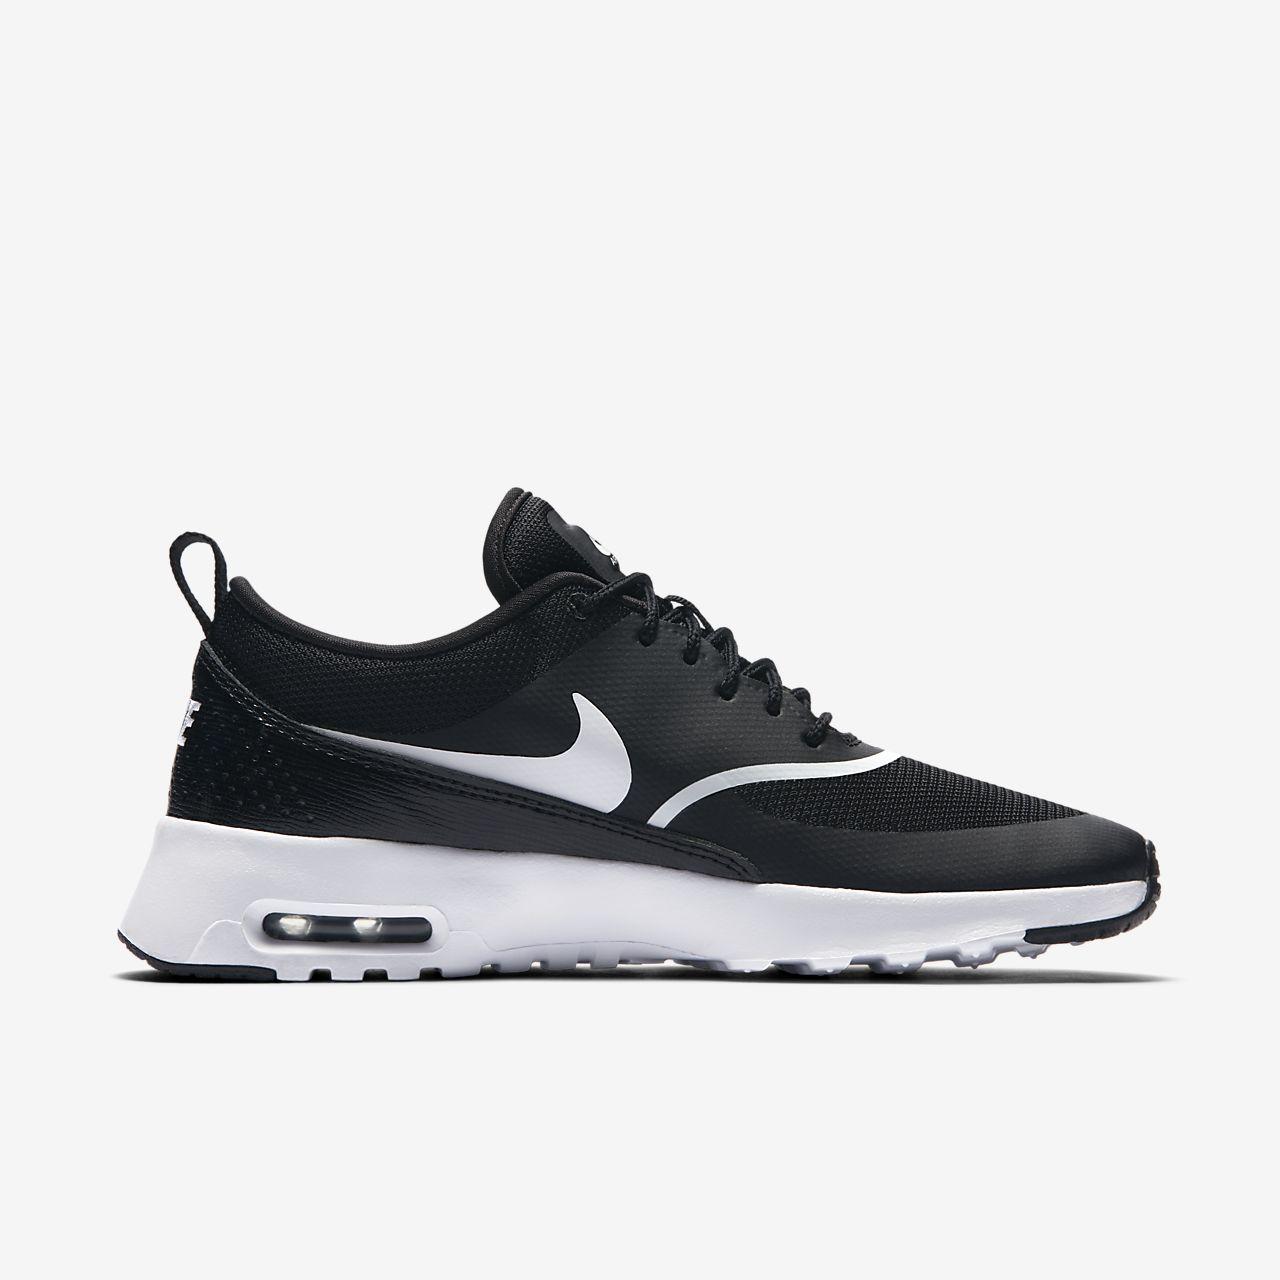 841a502fb0e Nike Air Max Thea Women's Shoe. Nike.com SG